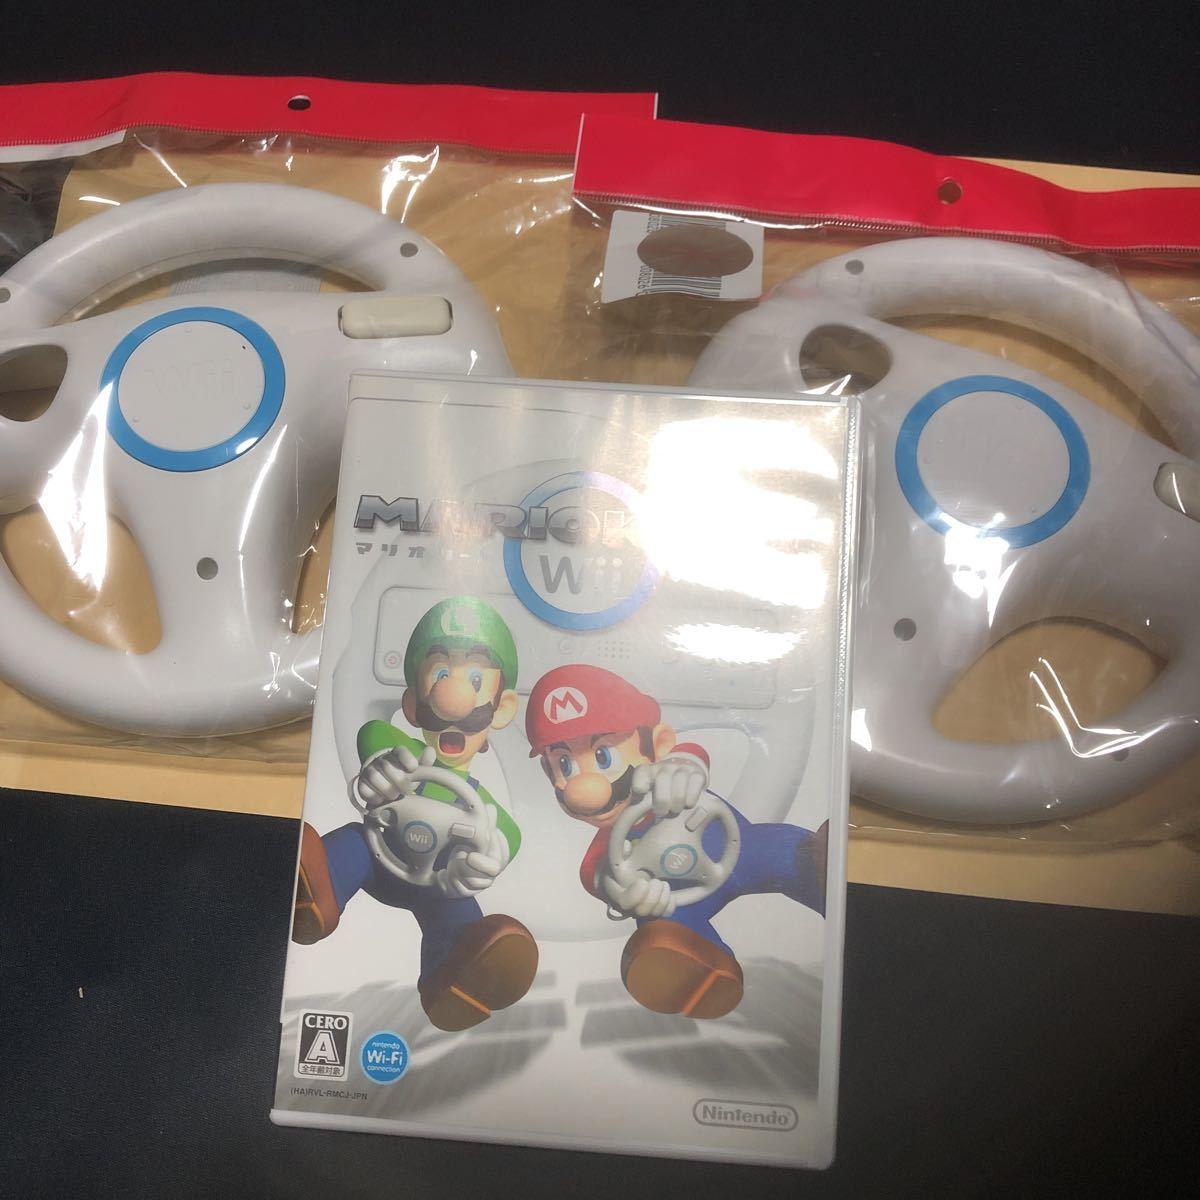 Wiiハンドル マリオカートWii セット 起動確認済み 送料無料